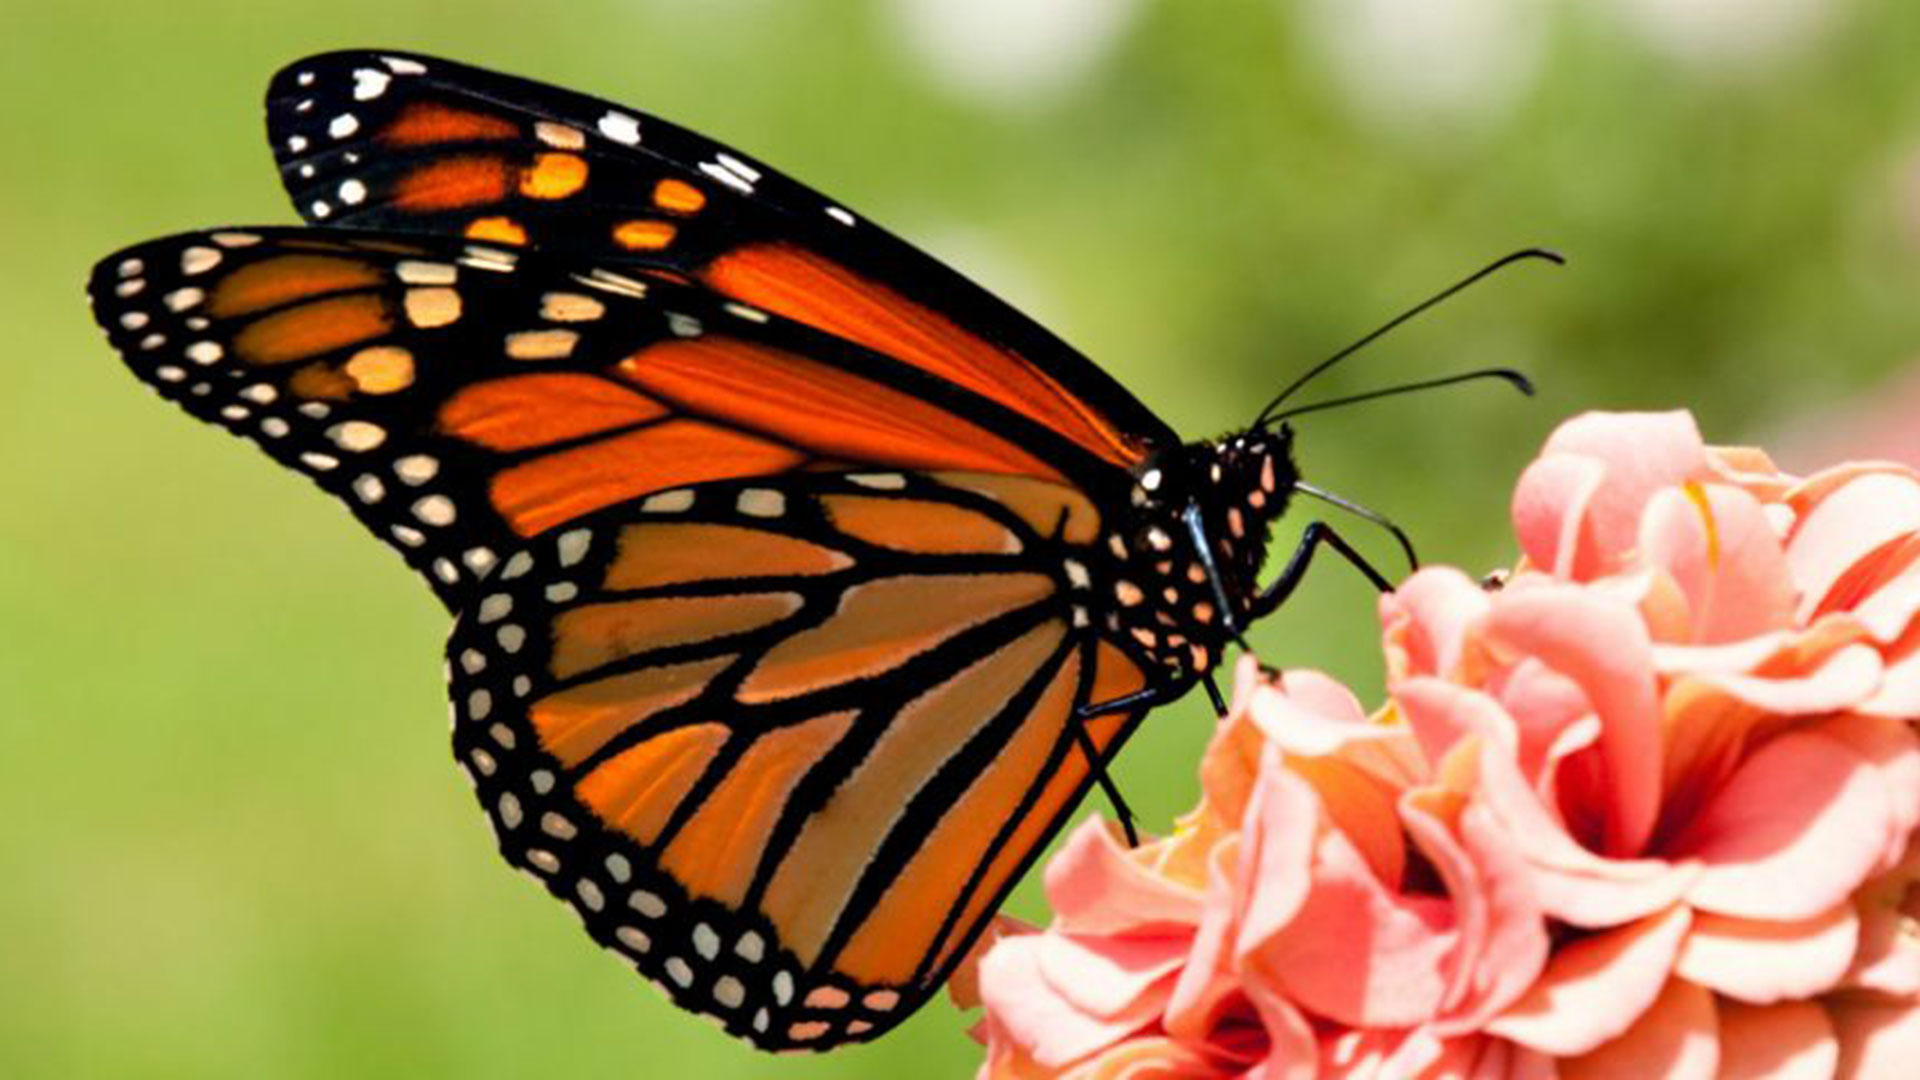 Primeras mariposas Monarca llegan a bosques de Michoacán